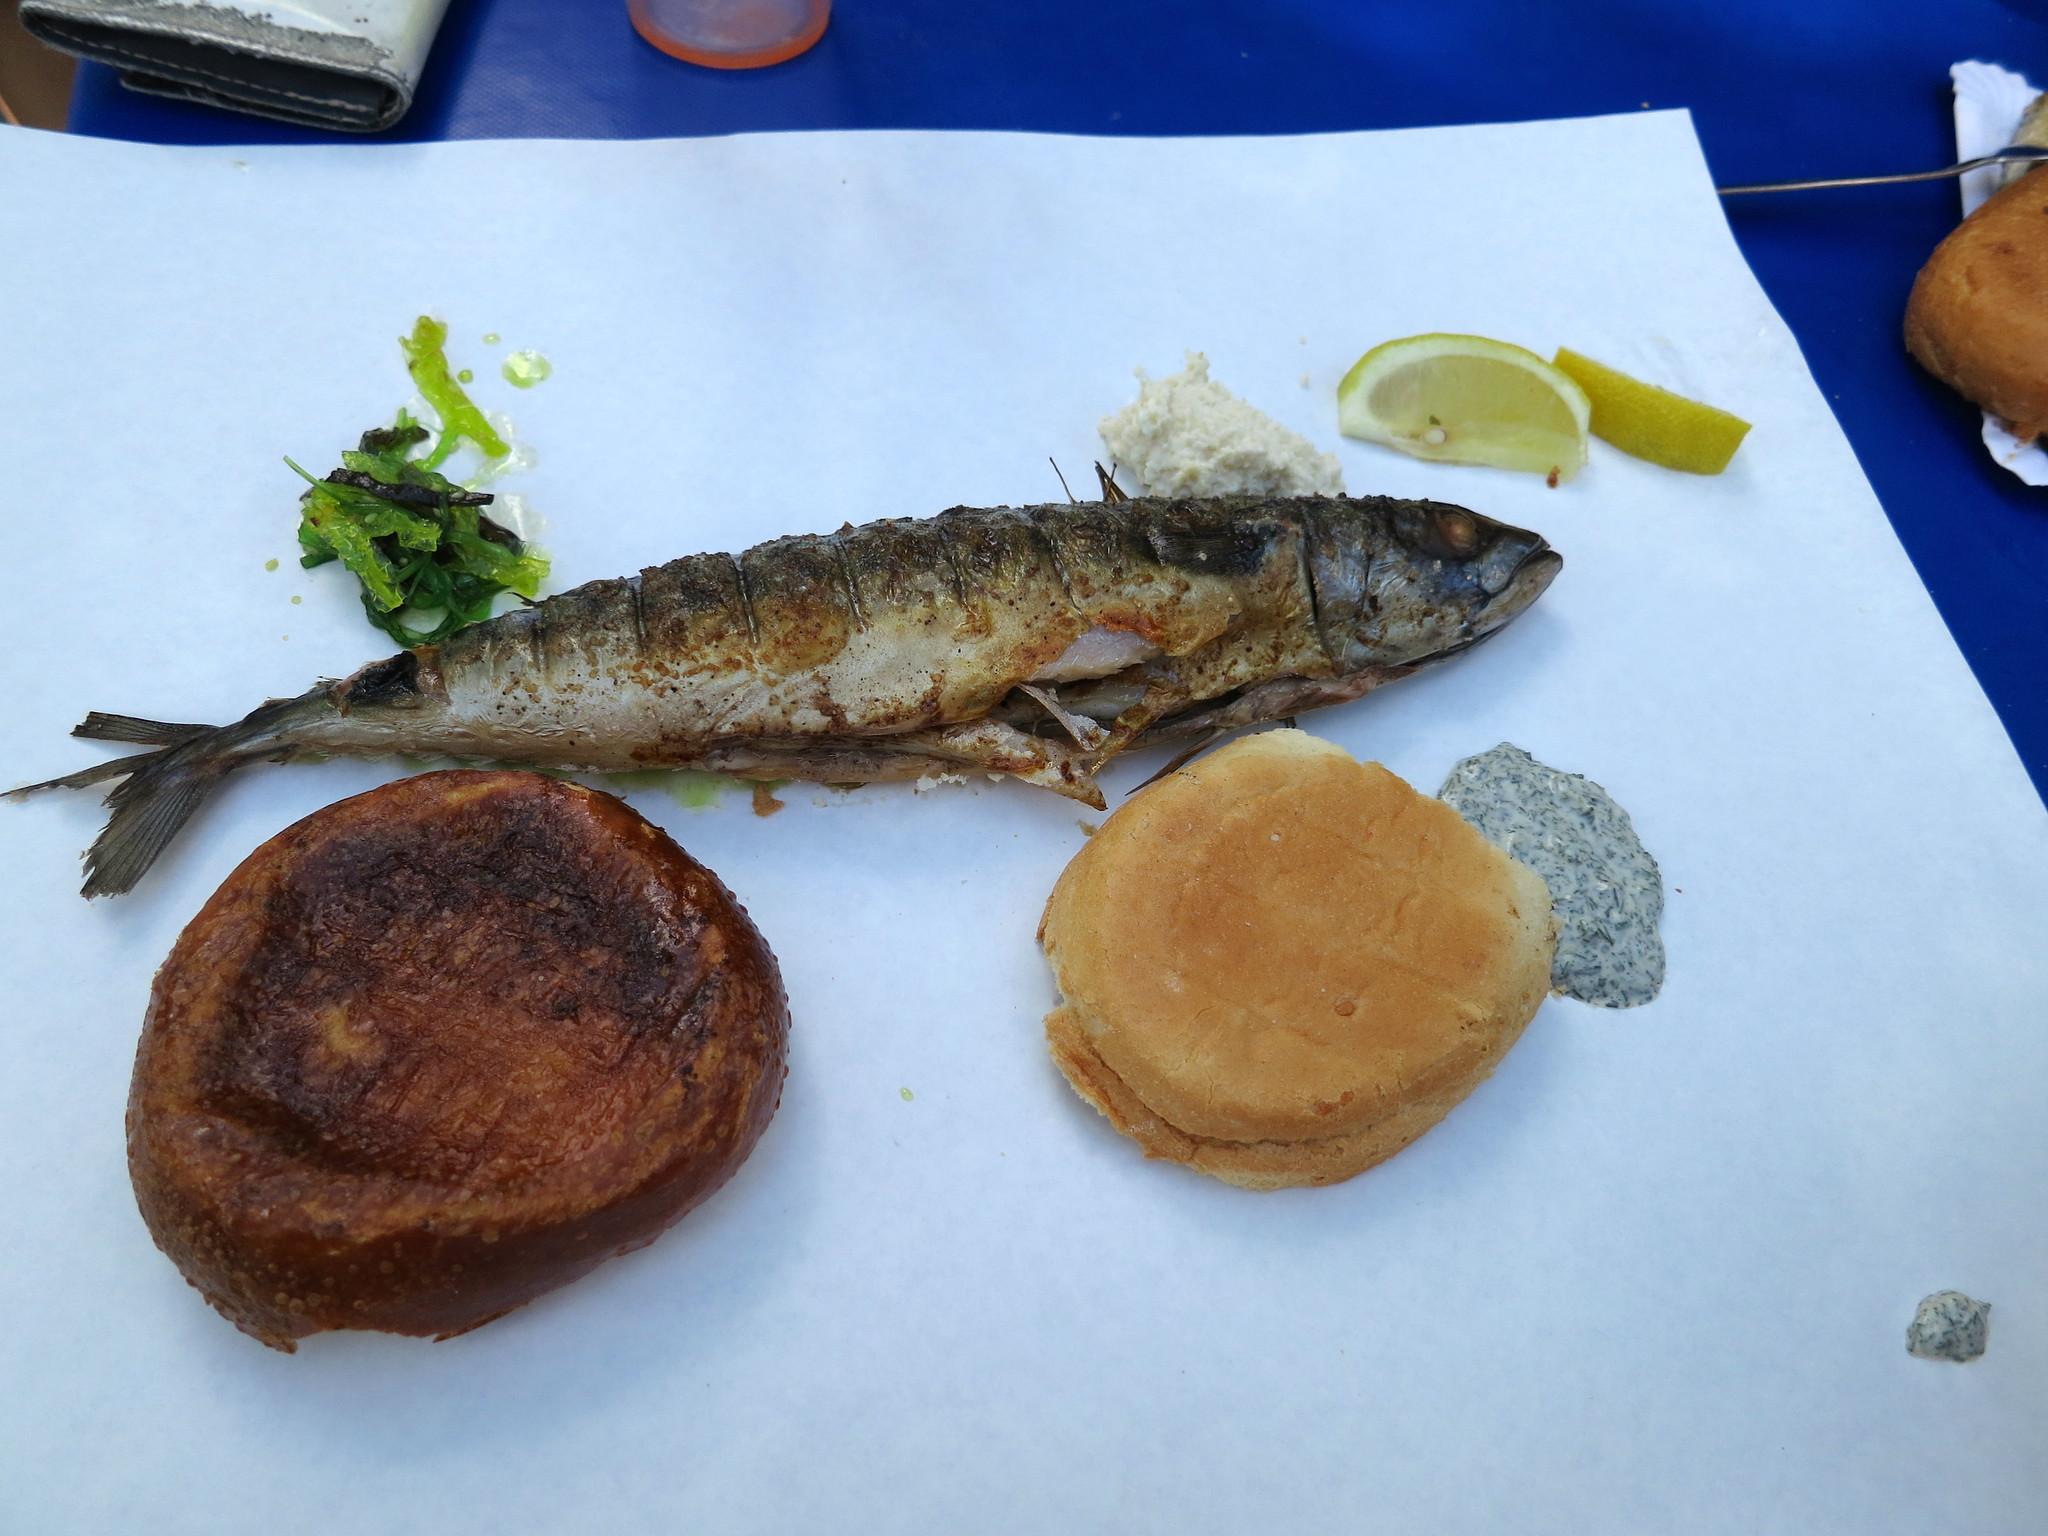 Winterfeldtplatz grilled fish under license CC BY 2.0 via Flickr user Alper Cugun.jpg